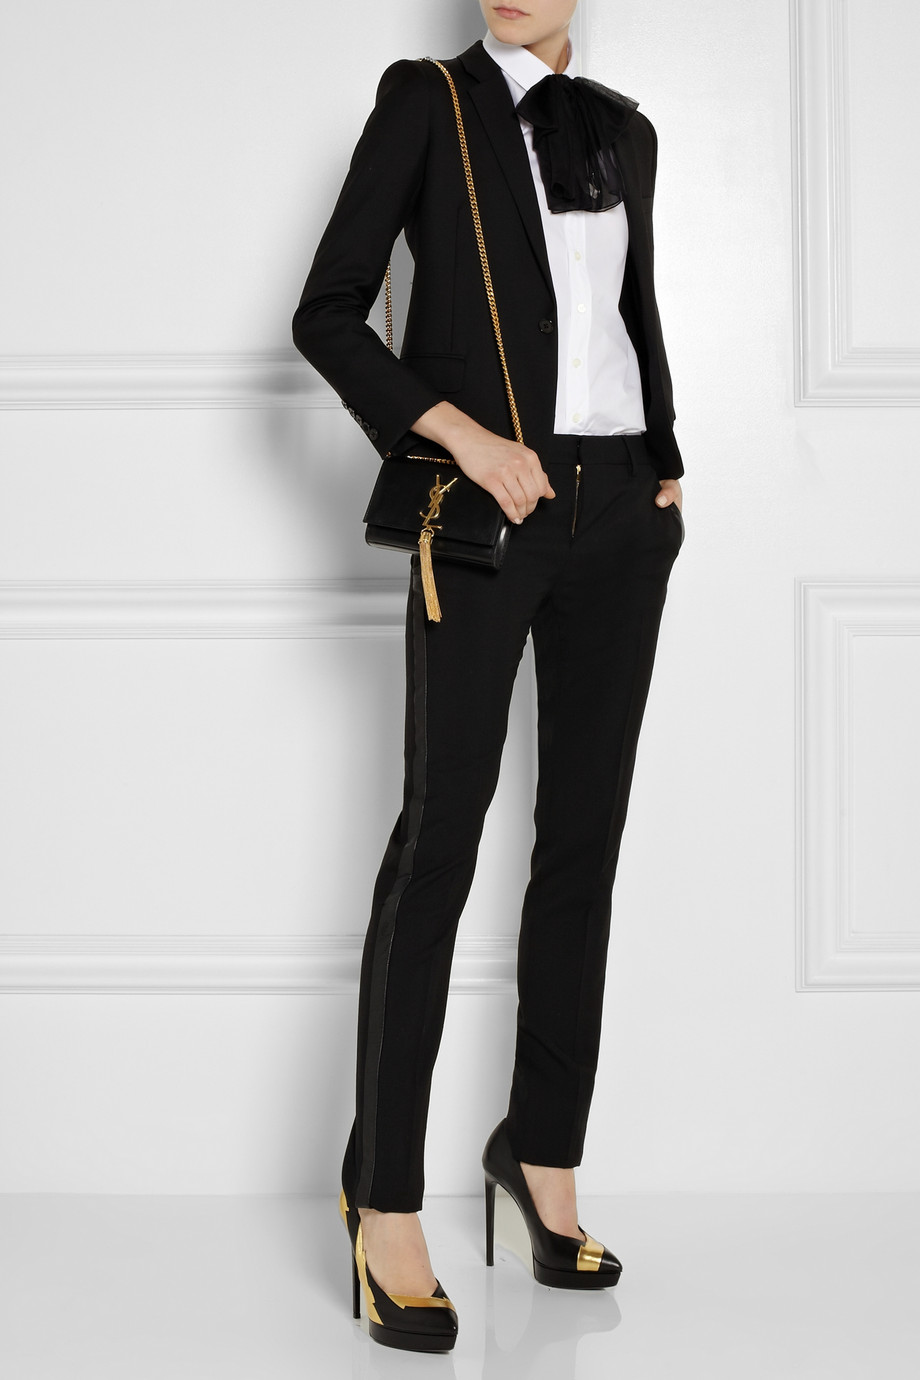 16204105e4c8 Saint Laurent Cassandre Leather Shoulder Bag in Black - Lyst